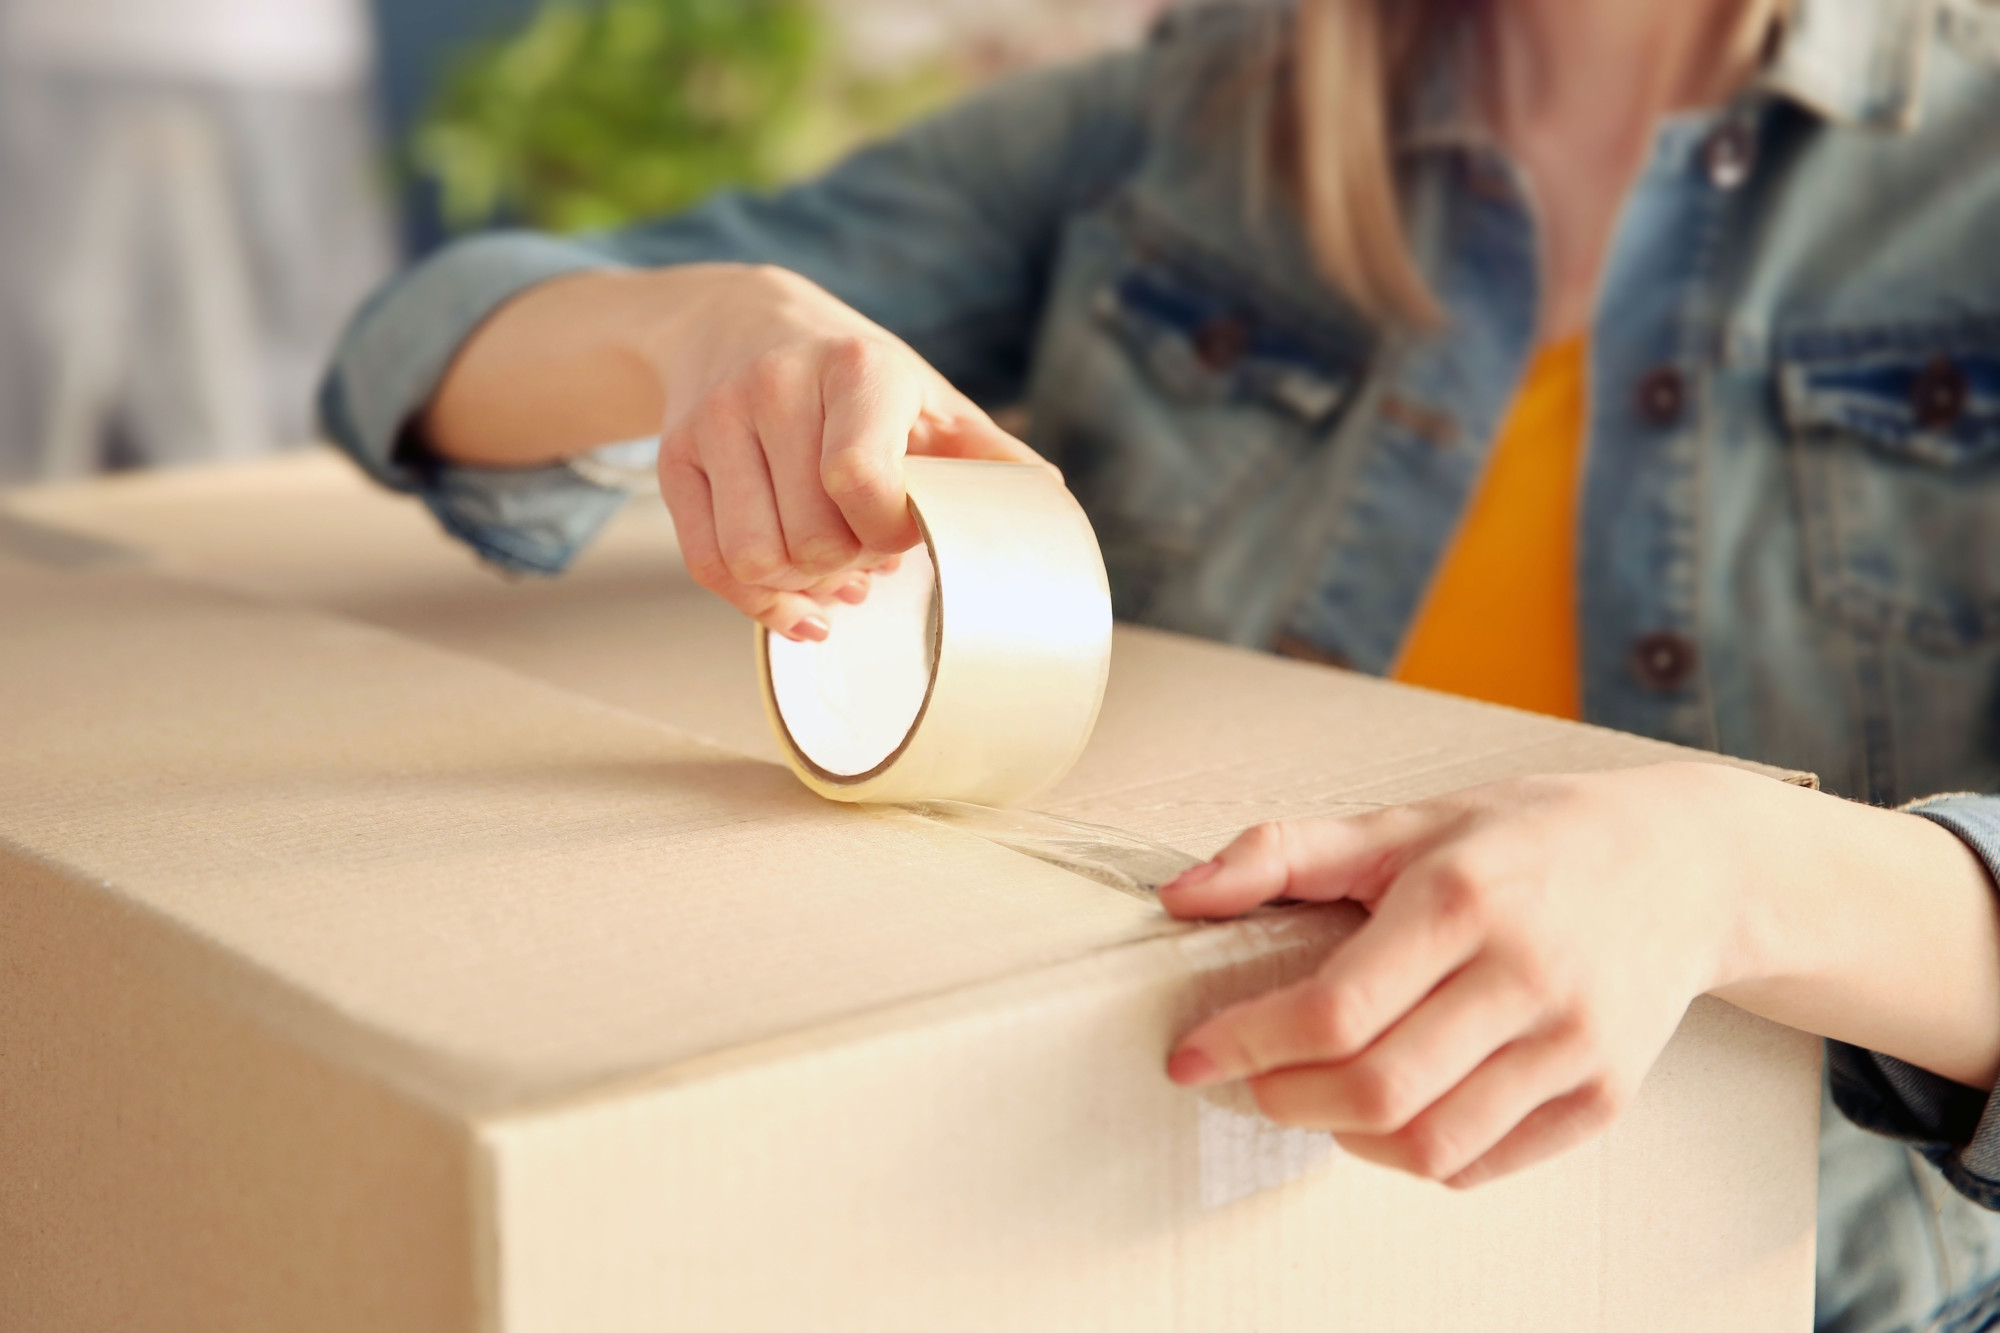 Young girl sealing with tape big cardboard box